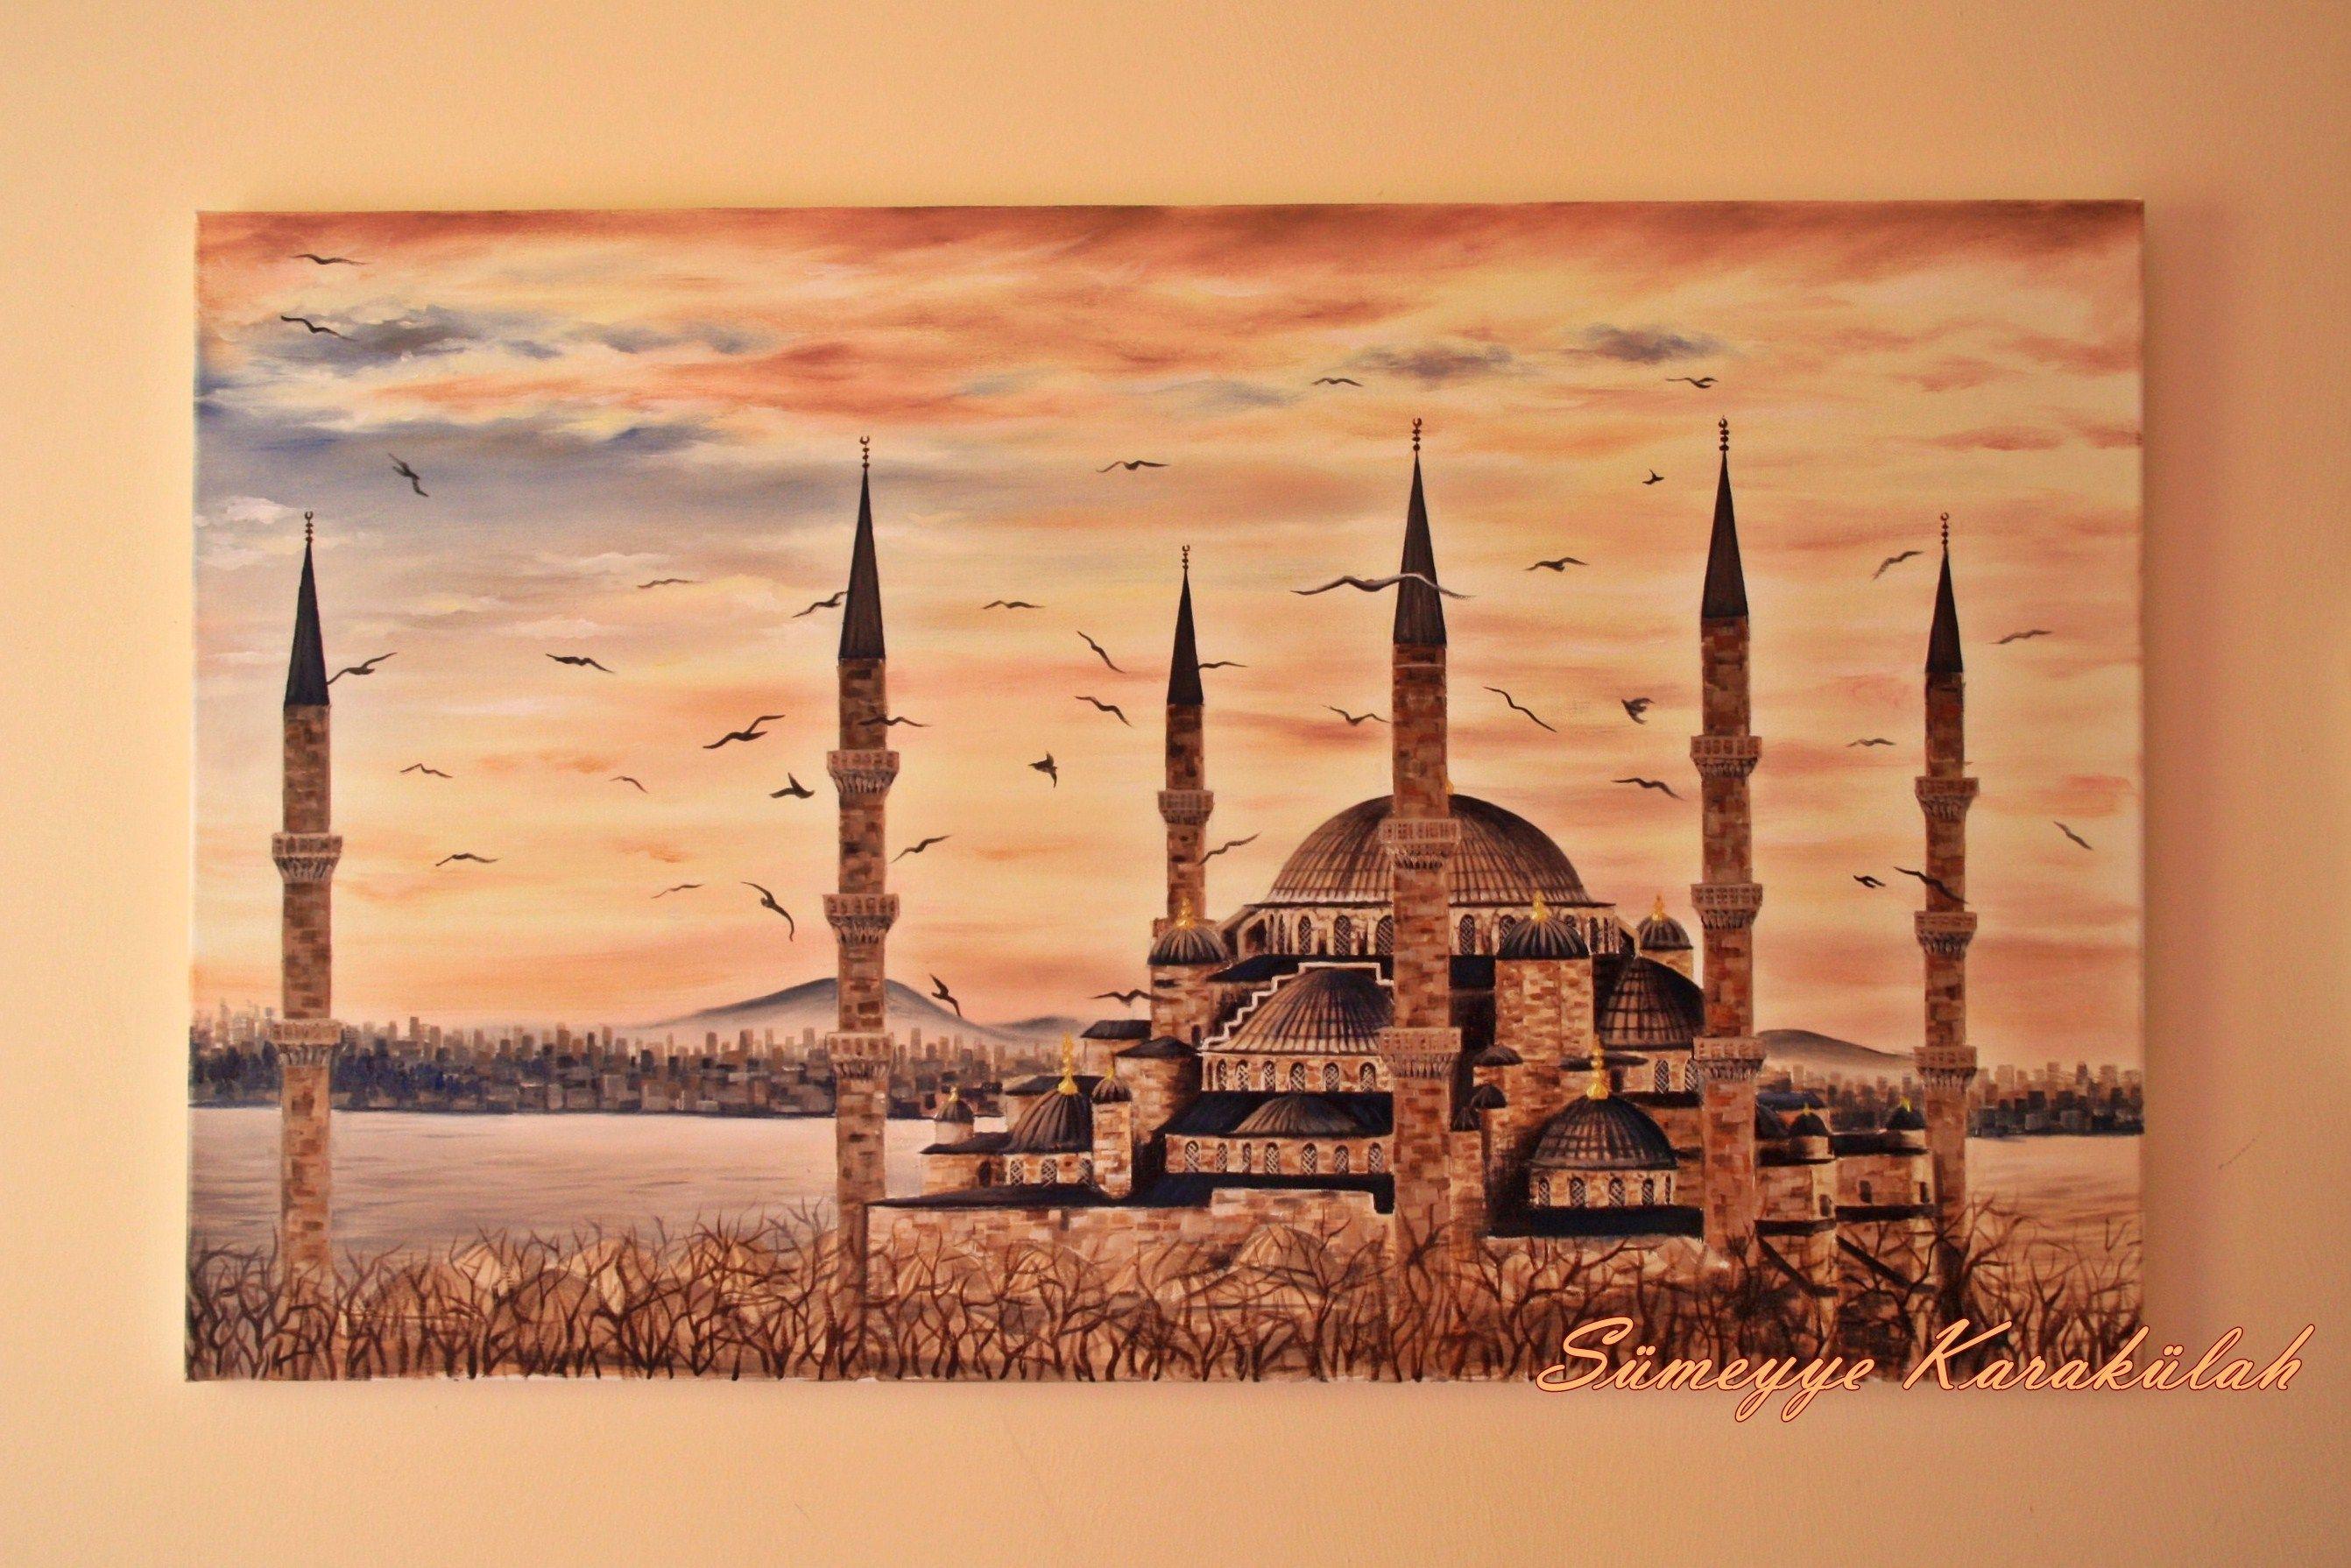 Yagliboya Sultanahmet Camii Oilpainting Istanbul Turkey Sumeyye